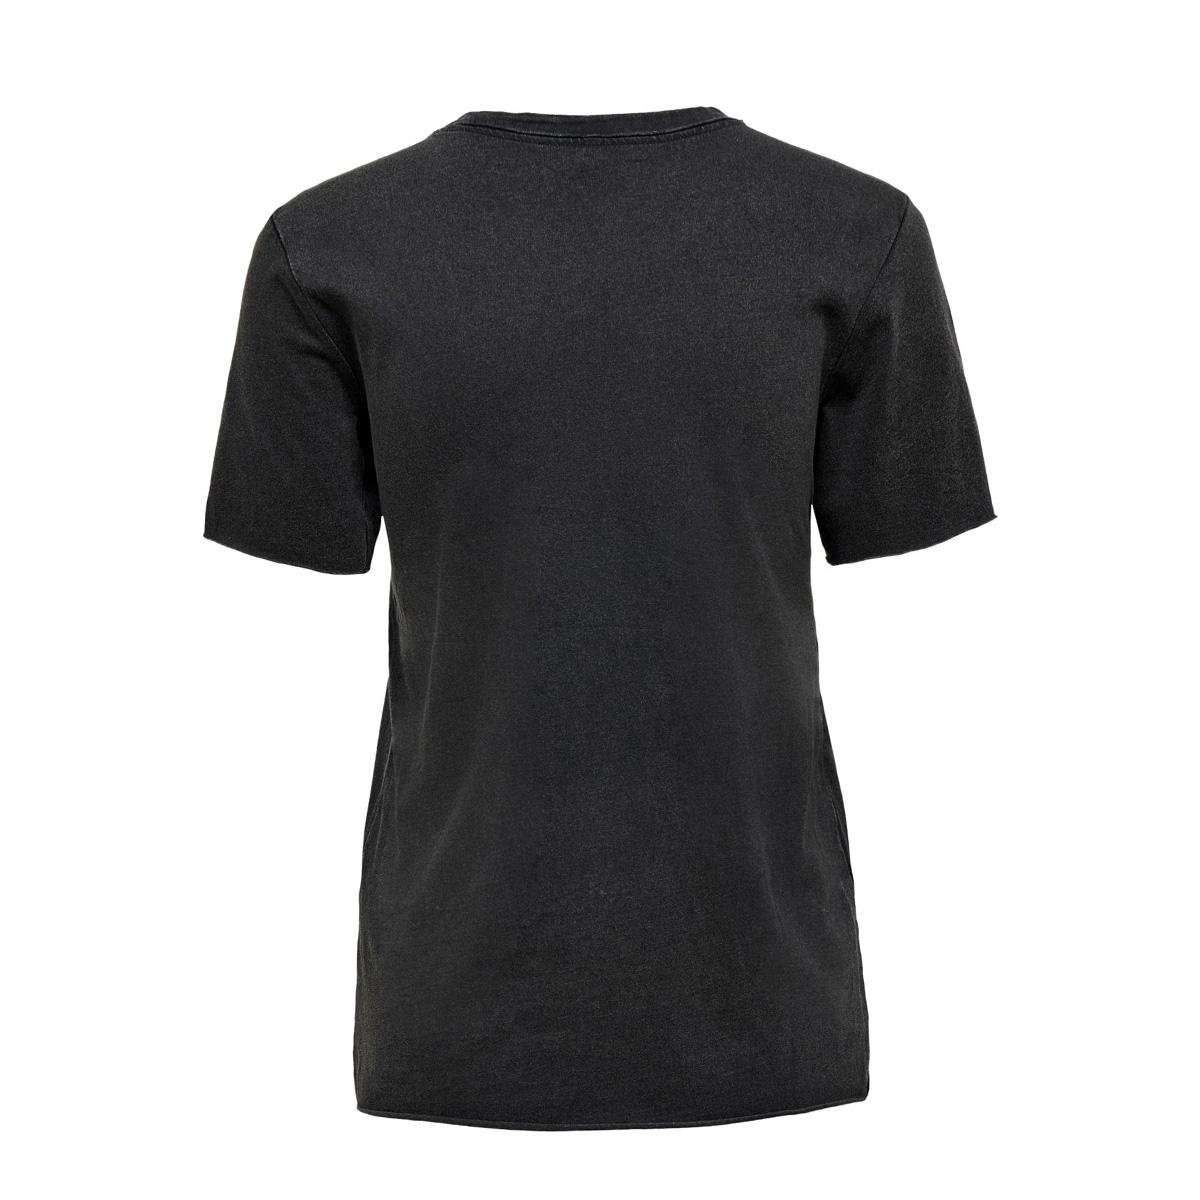 onllucy reg s/s road top box acid c 15192905 only t-shirt black/nowhere